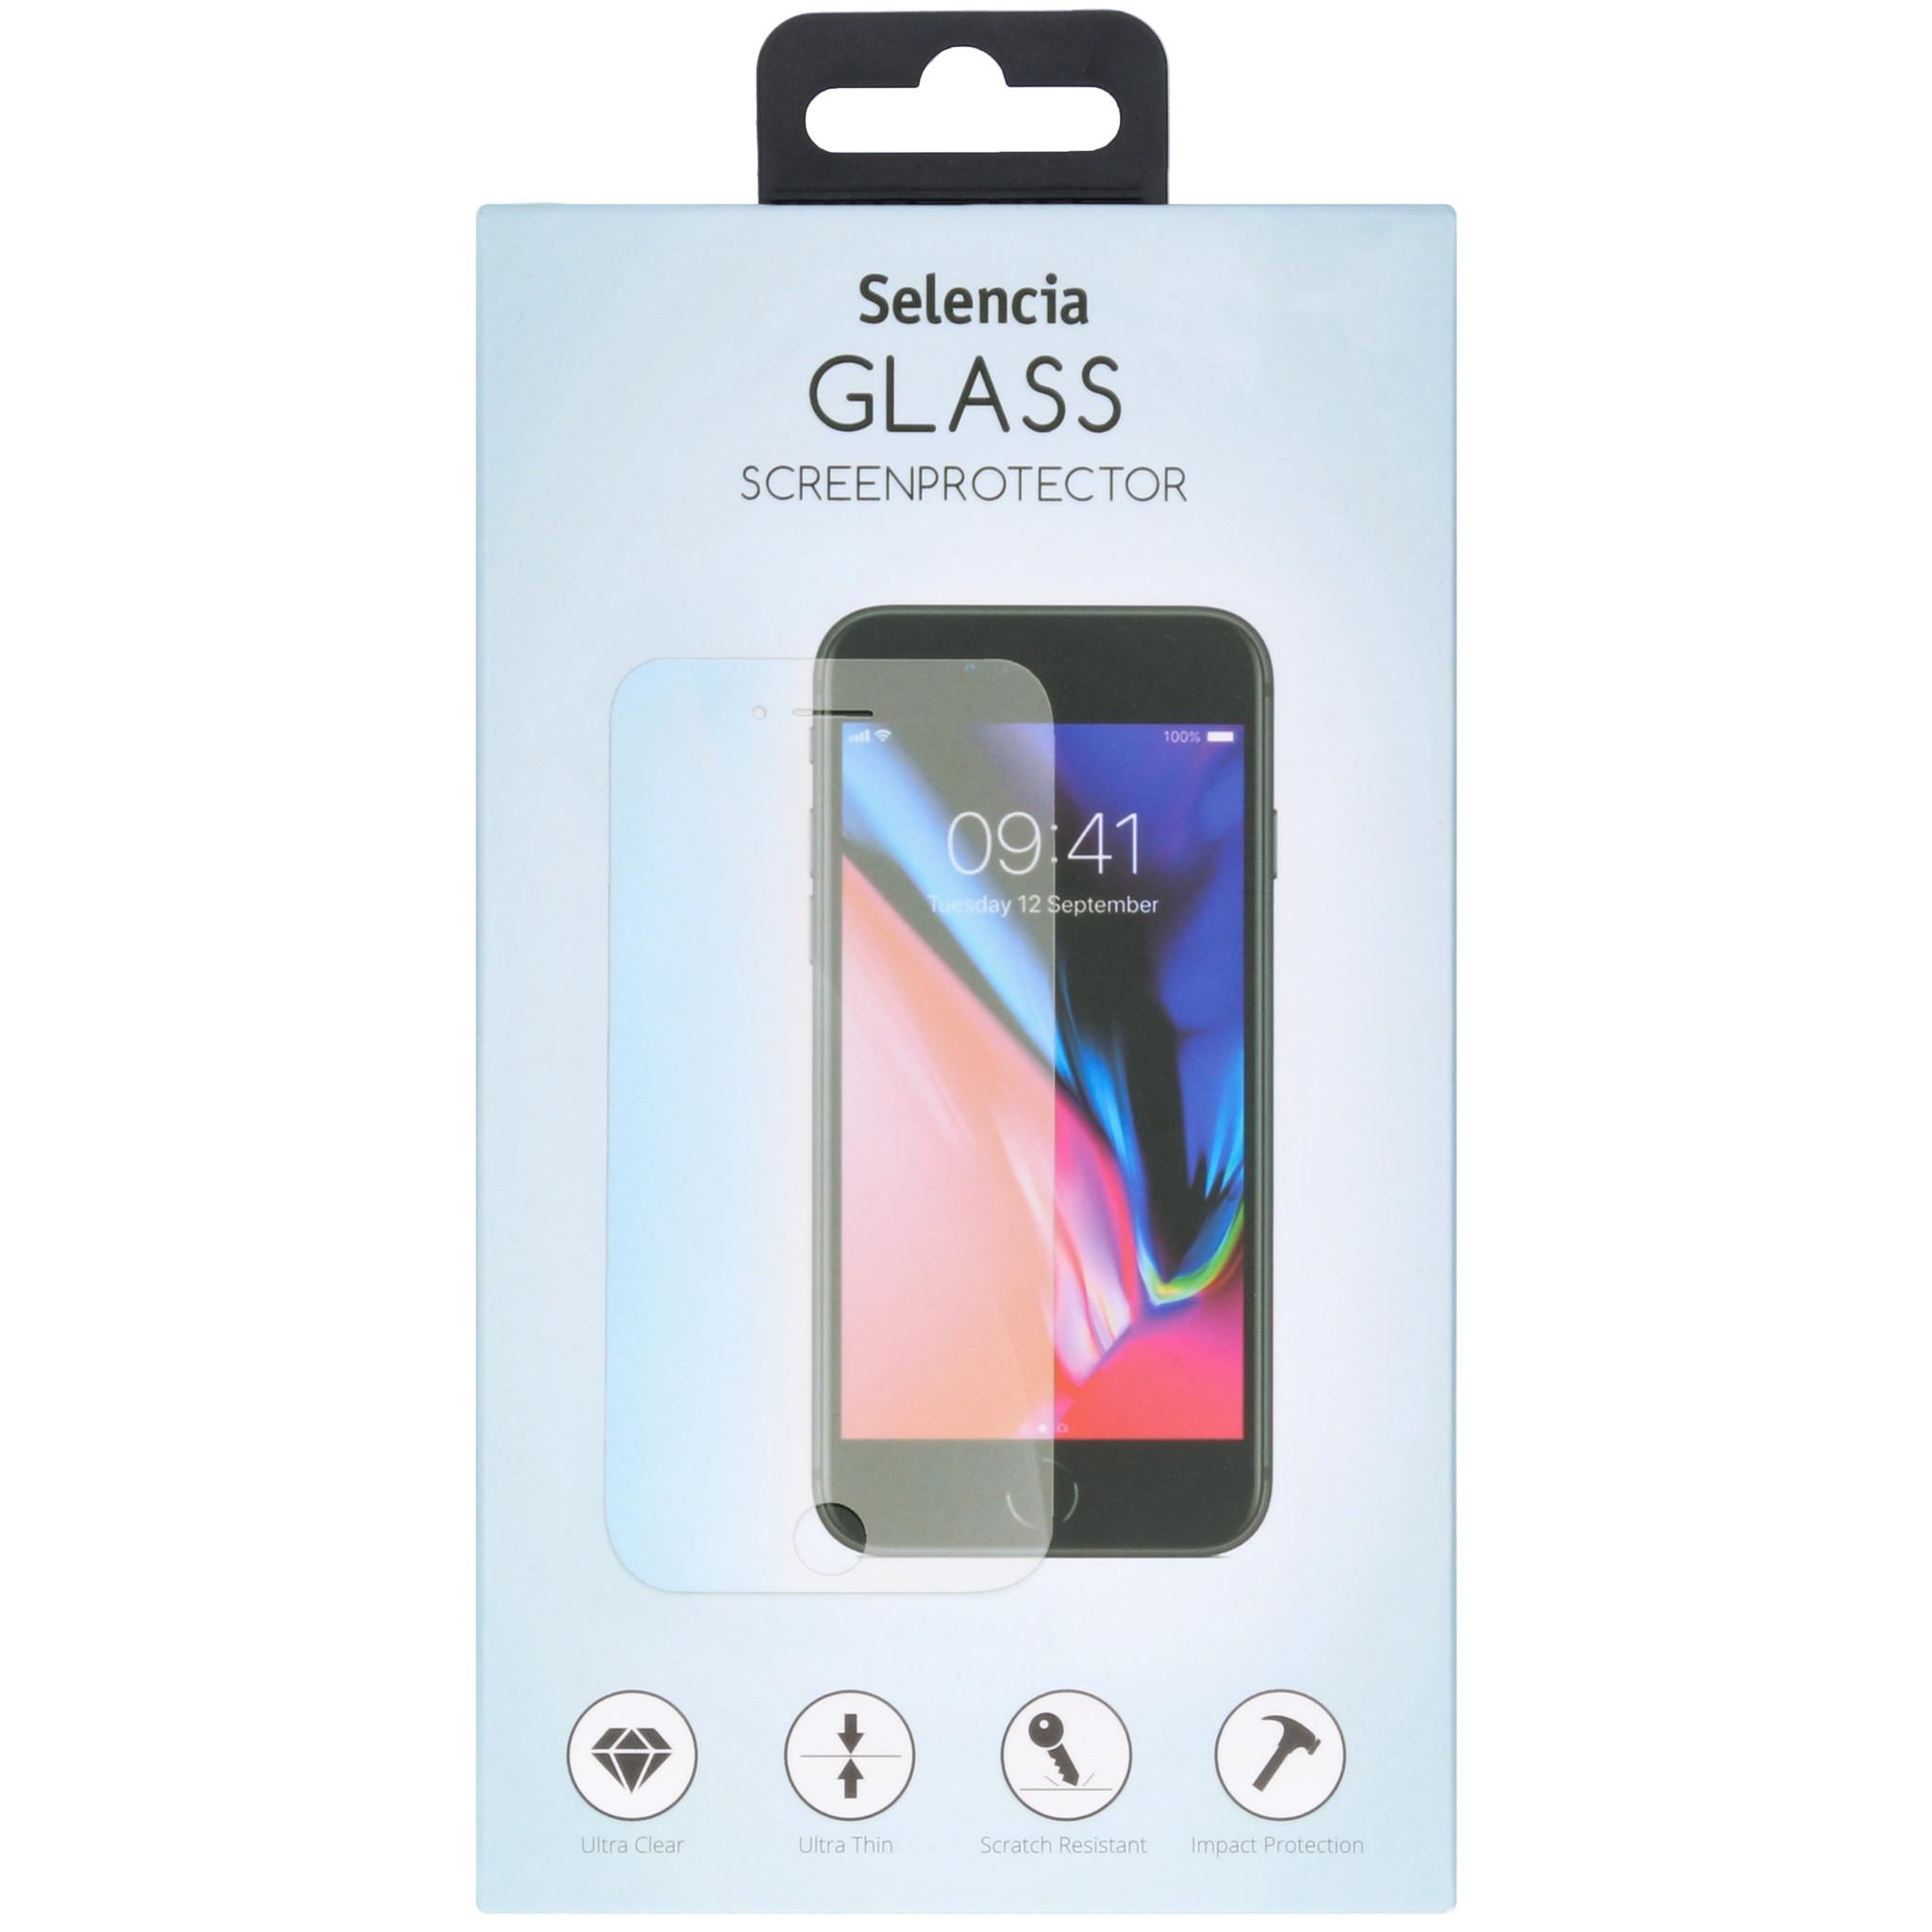 Selencia Gehard Glas Screenprotector Huawei P Smart Plus